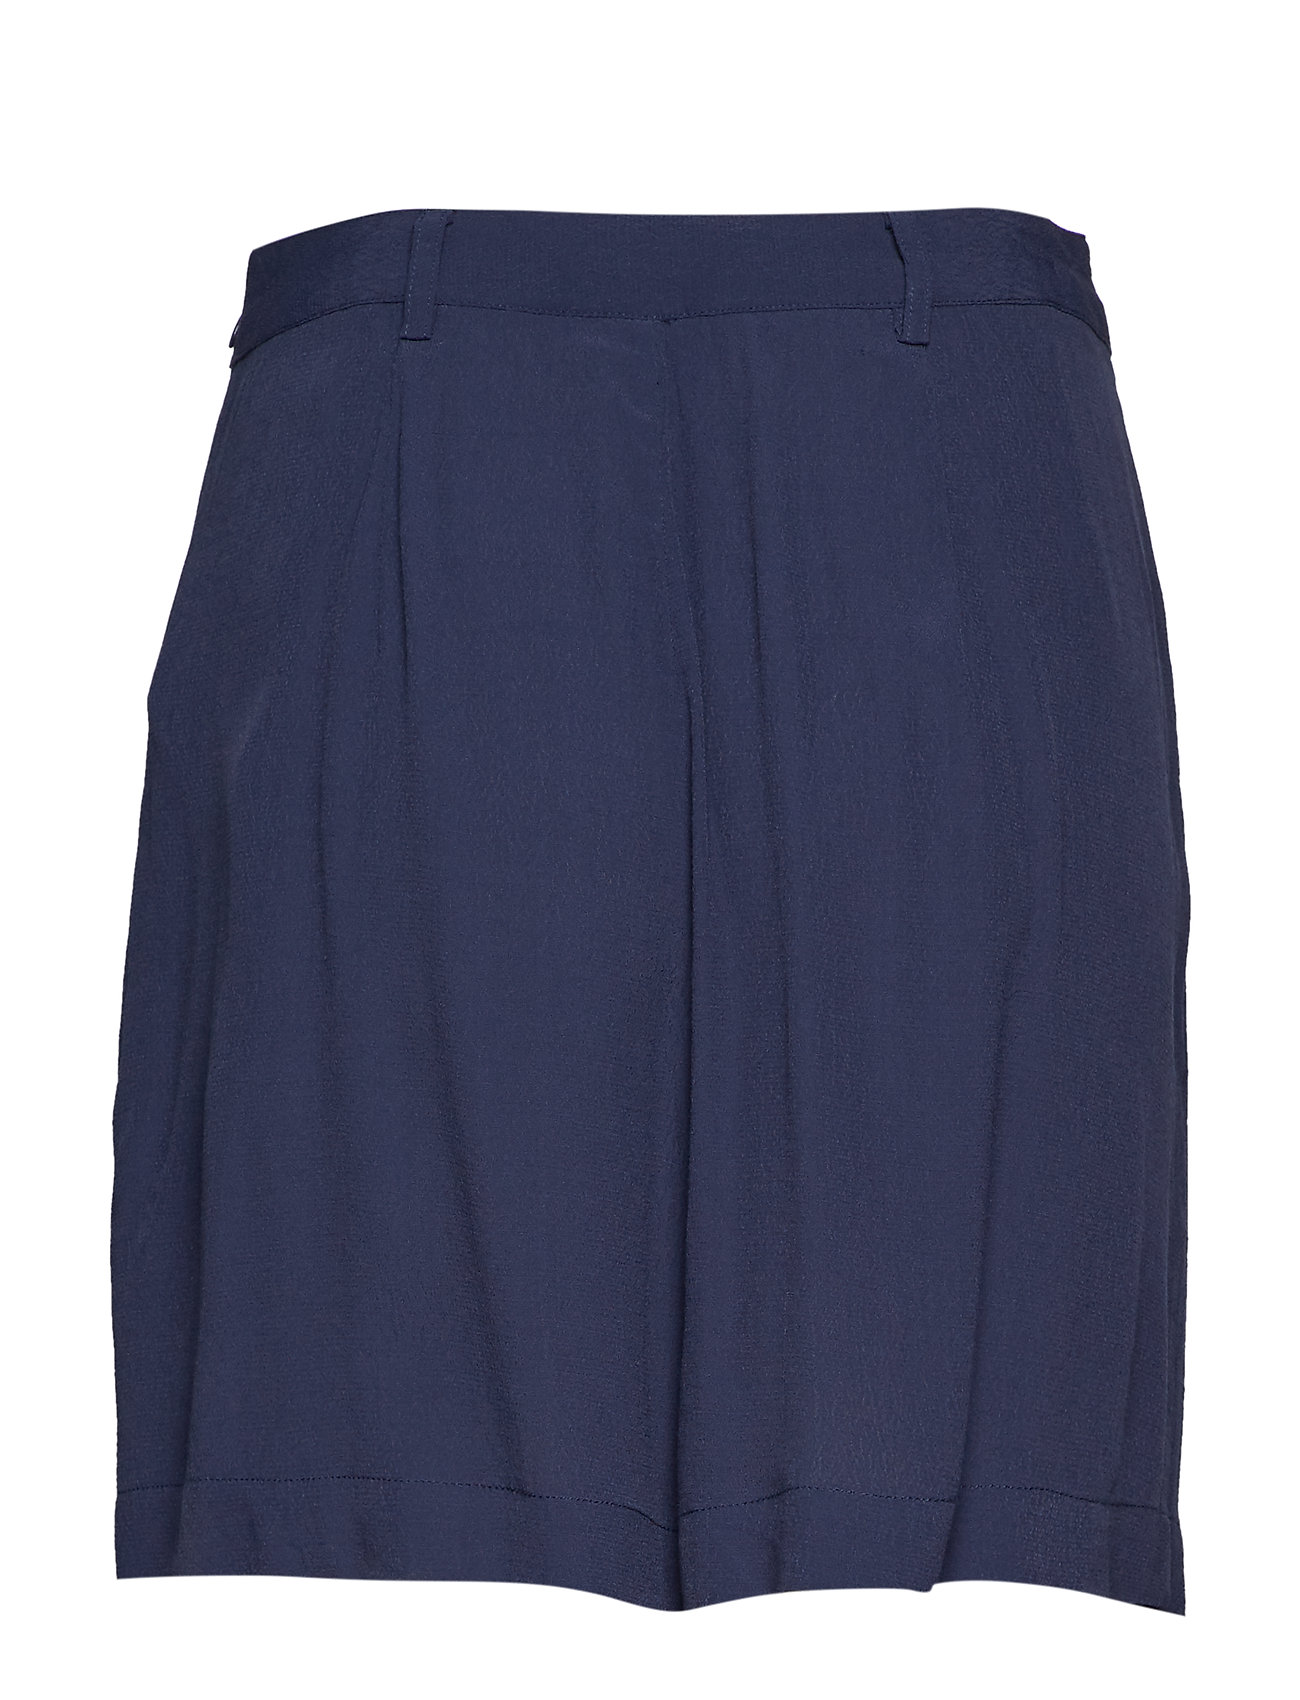 Tjw Fluid Detail IrisTommy Jeans Bow Shortblack vwn0mN8